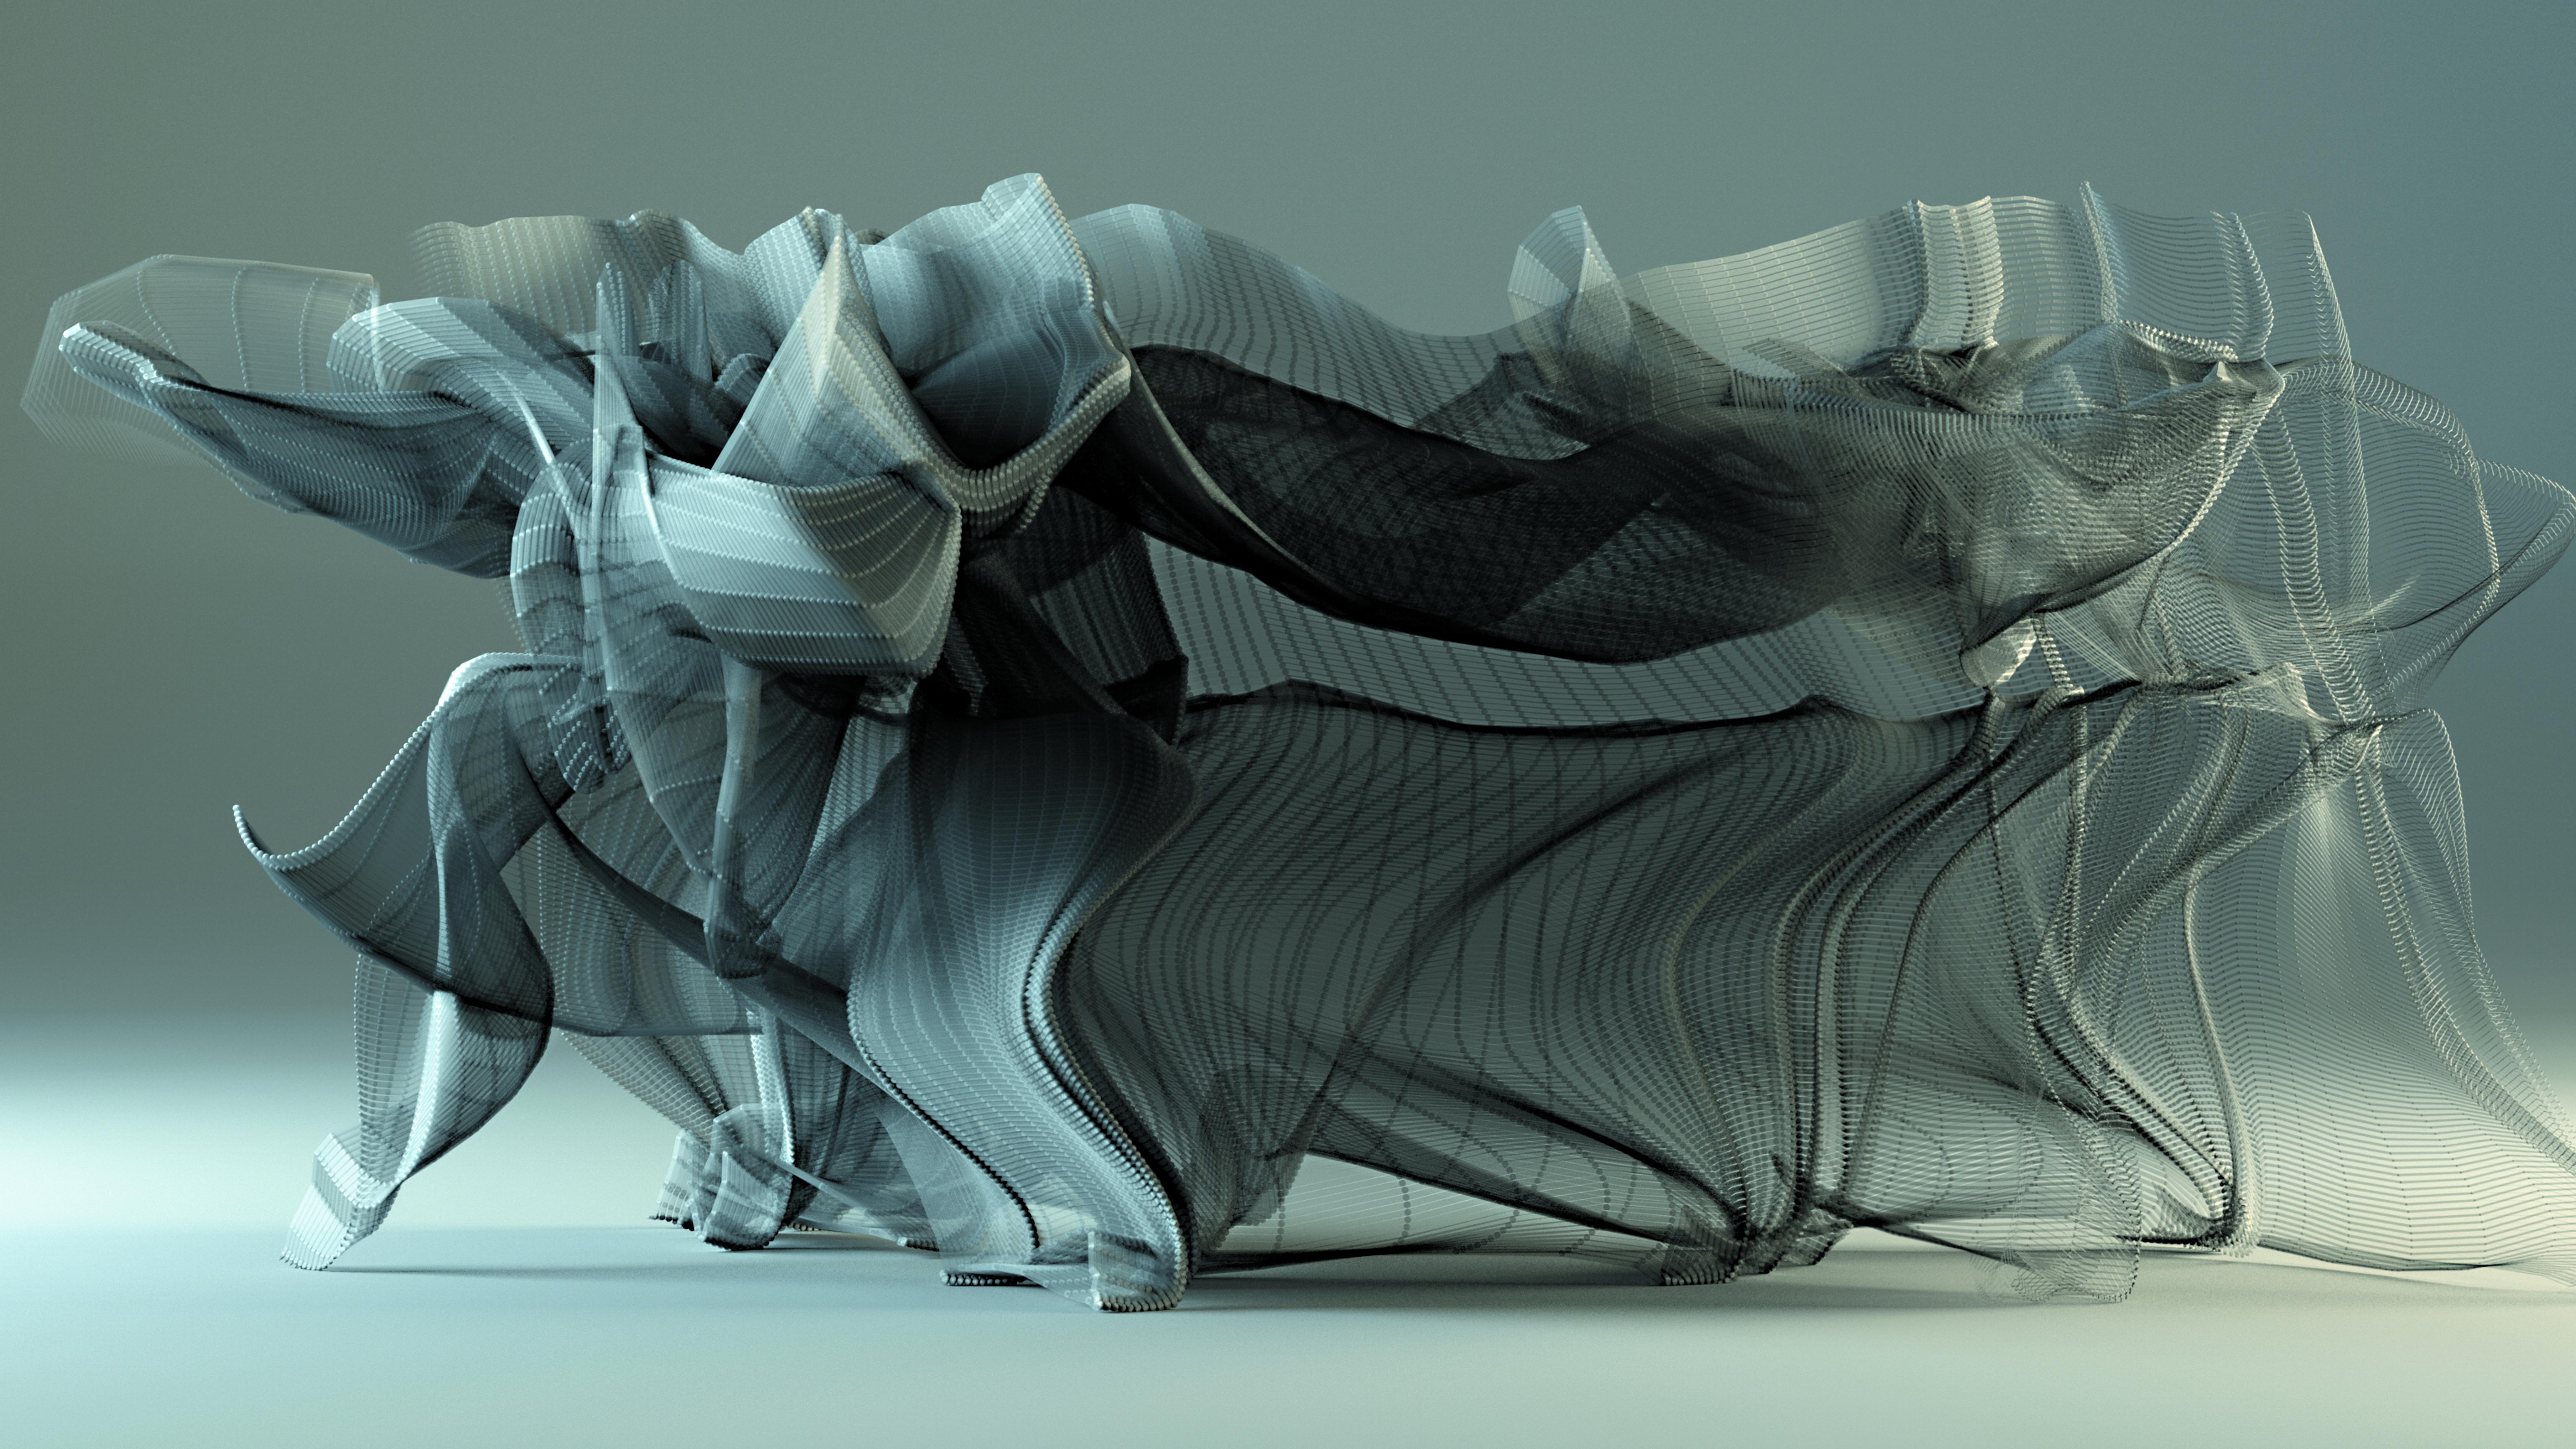 Still from video of motion visualization at 300 Years of Hakka Kung Fu exhibit at City University of Hong Kong.